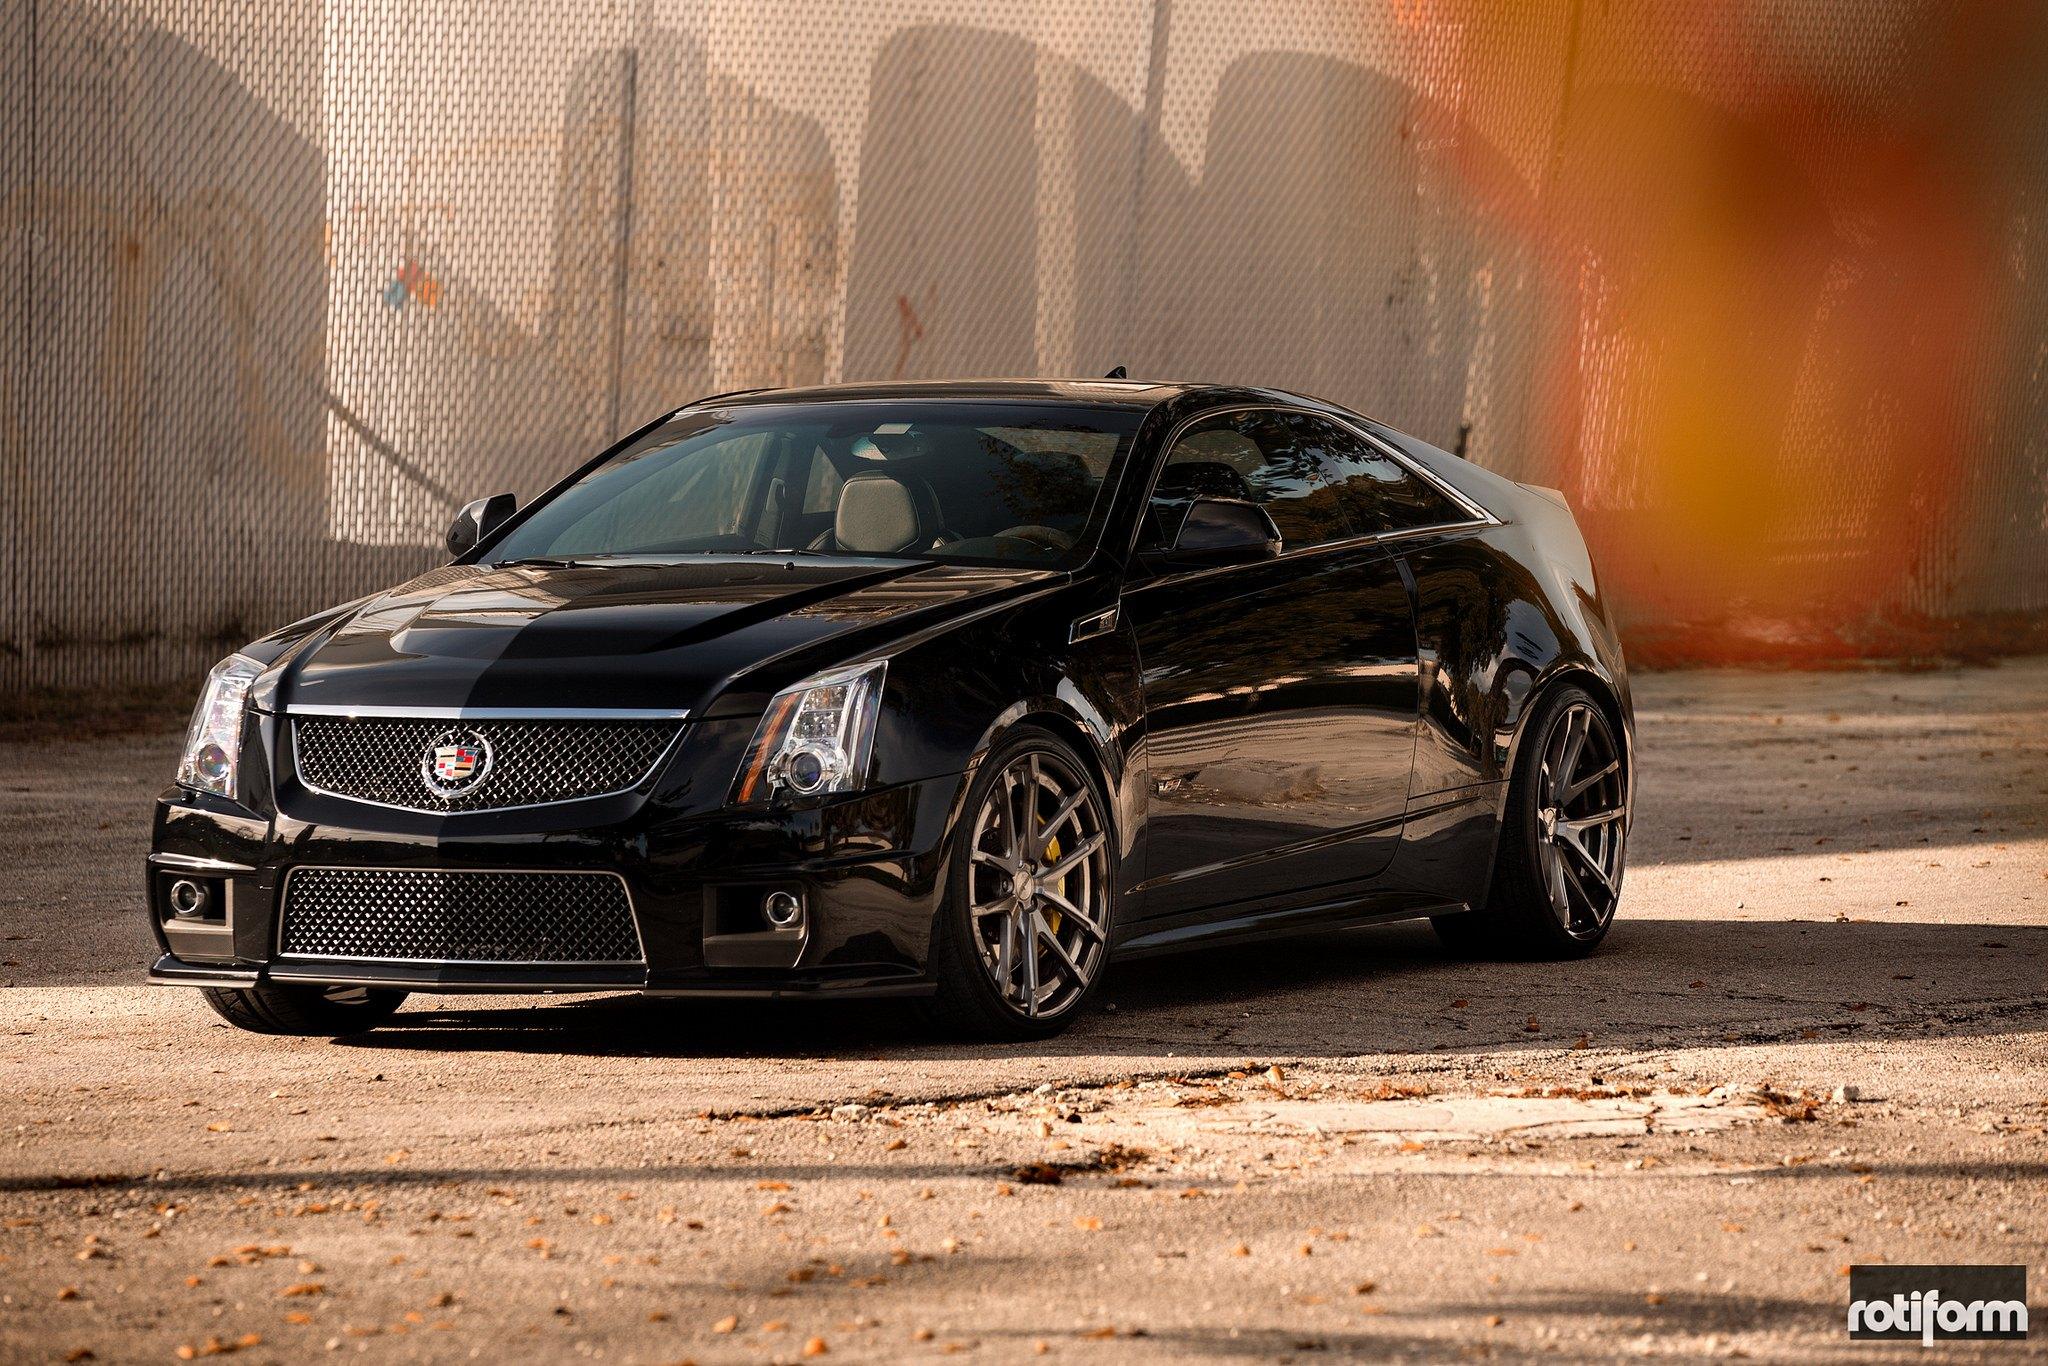 Custom 2009 Cadillac Cts Images Mods Photos Upgrades